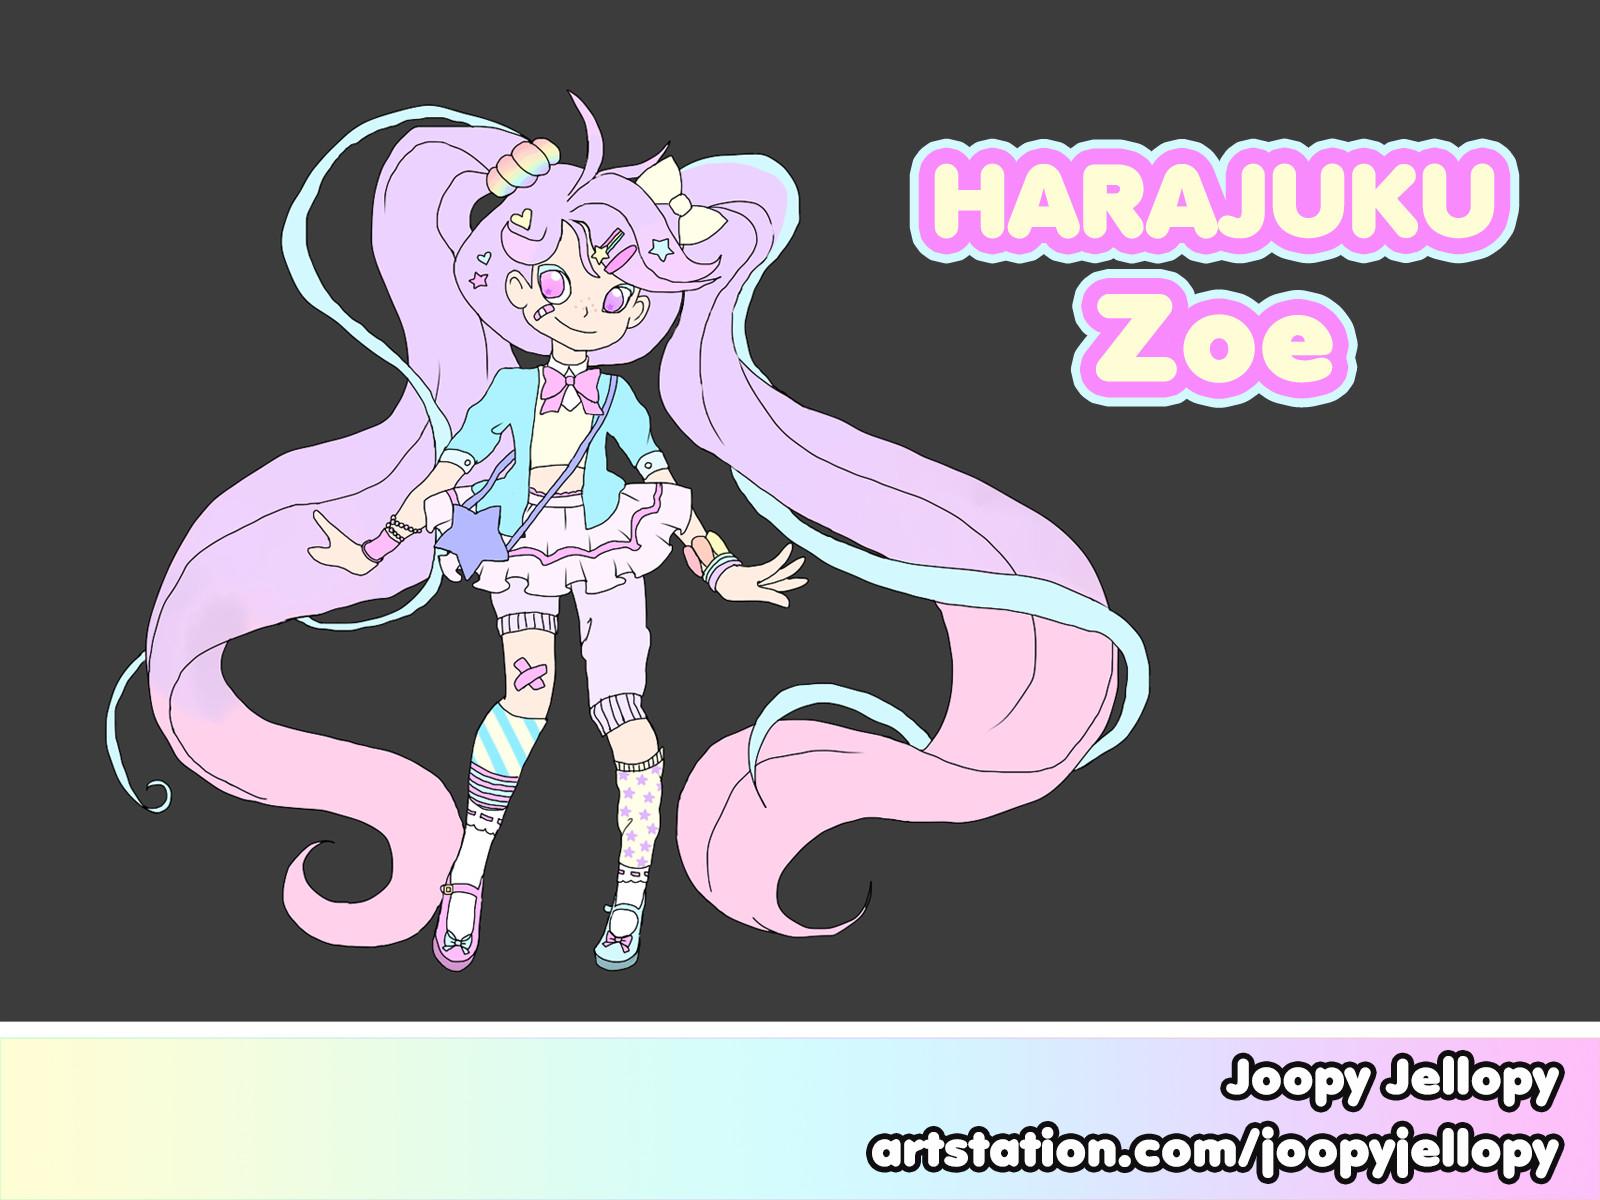 https://cdna.artstation.com/p/assets/images/images/009/722/992/large/joopy-jellopy-harajuku-zoe01.jpg?1520525241